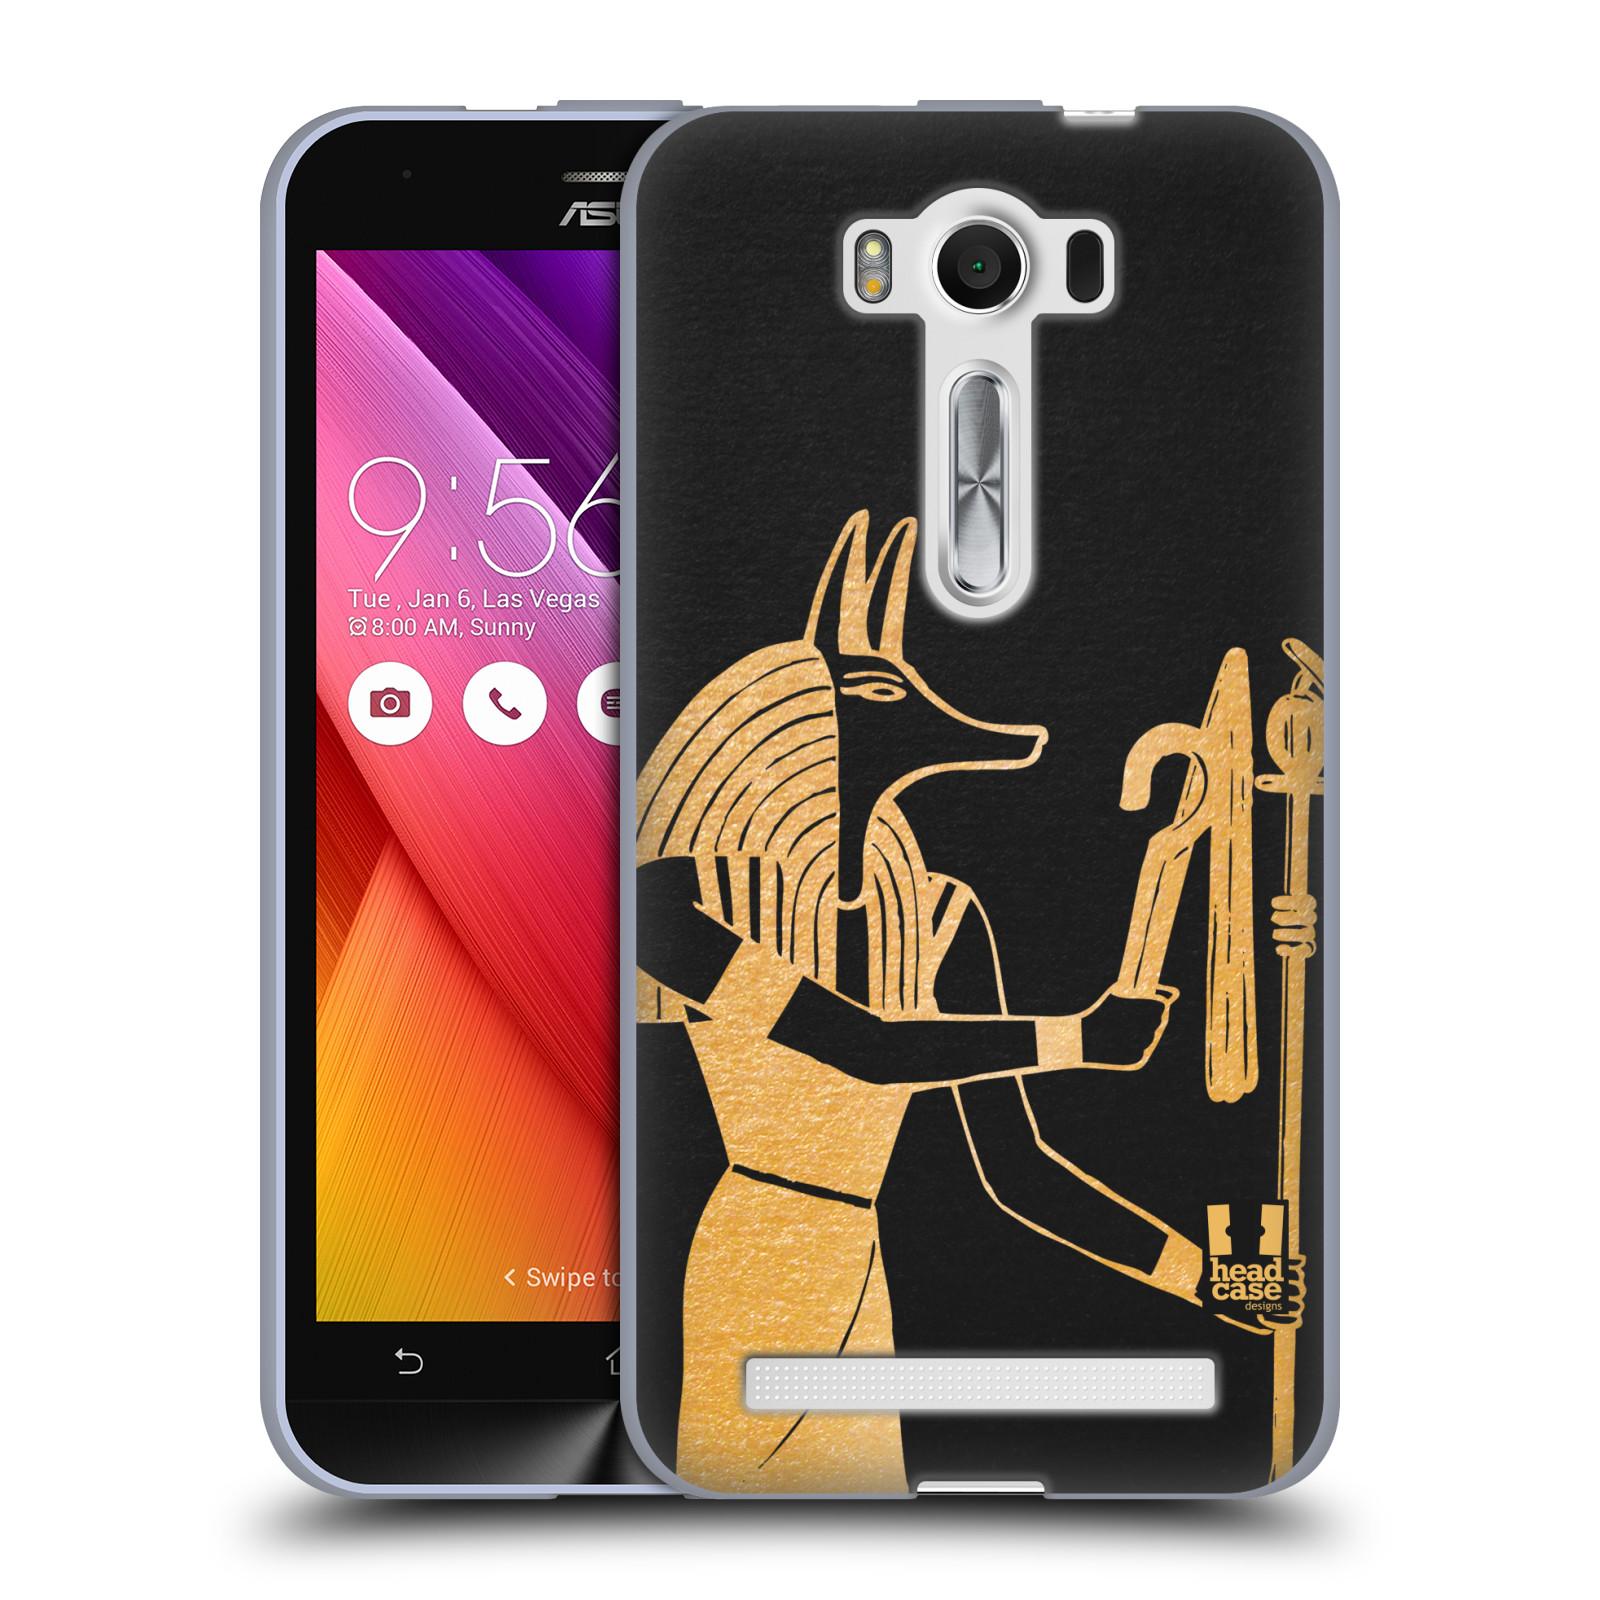 Silikonové pouzdro na mobil Asus ZenFone 2 Laser ZE500KL HEAD CASE EGYPT ANUBIS